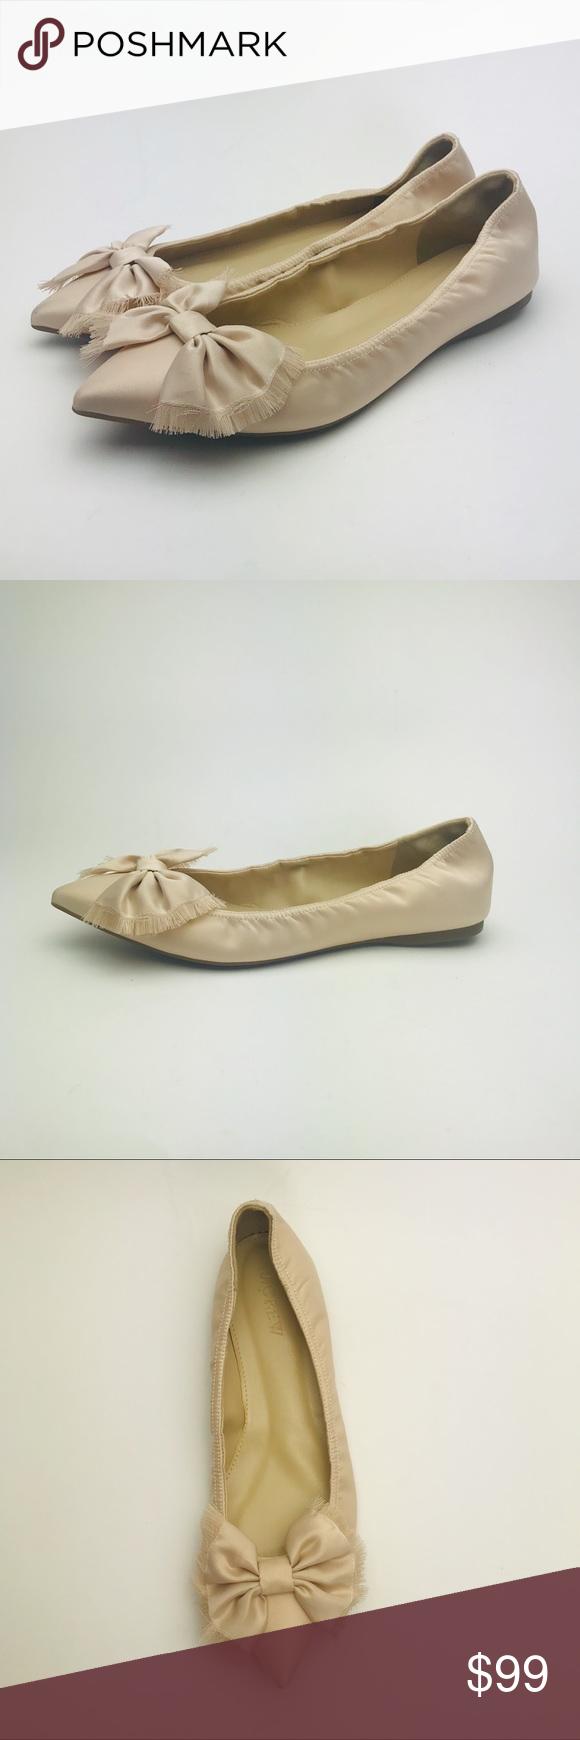 J.CREW Pink Lottie Bow Flats in Satin 7